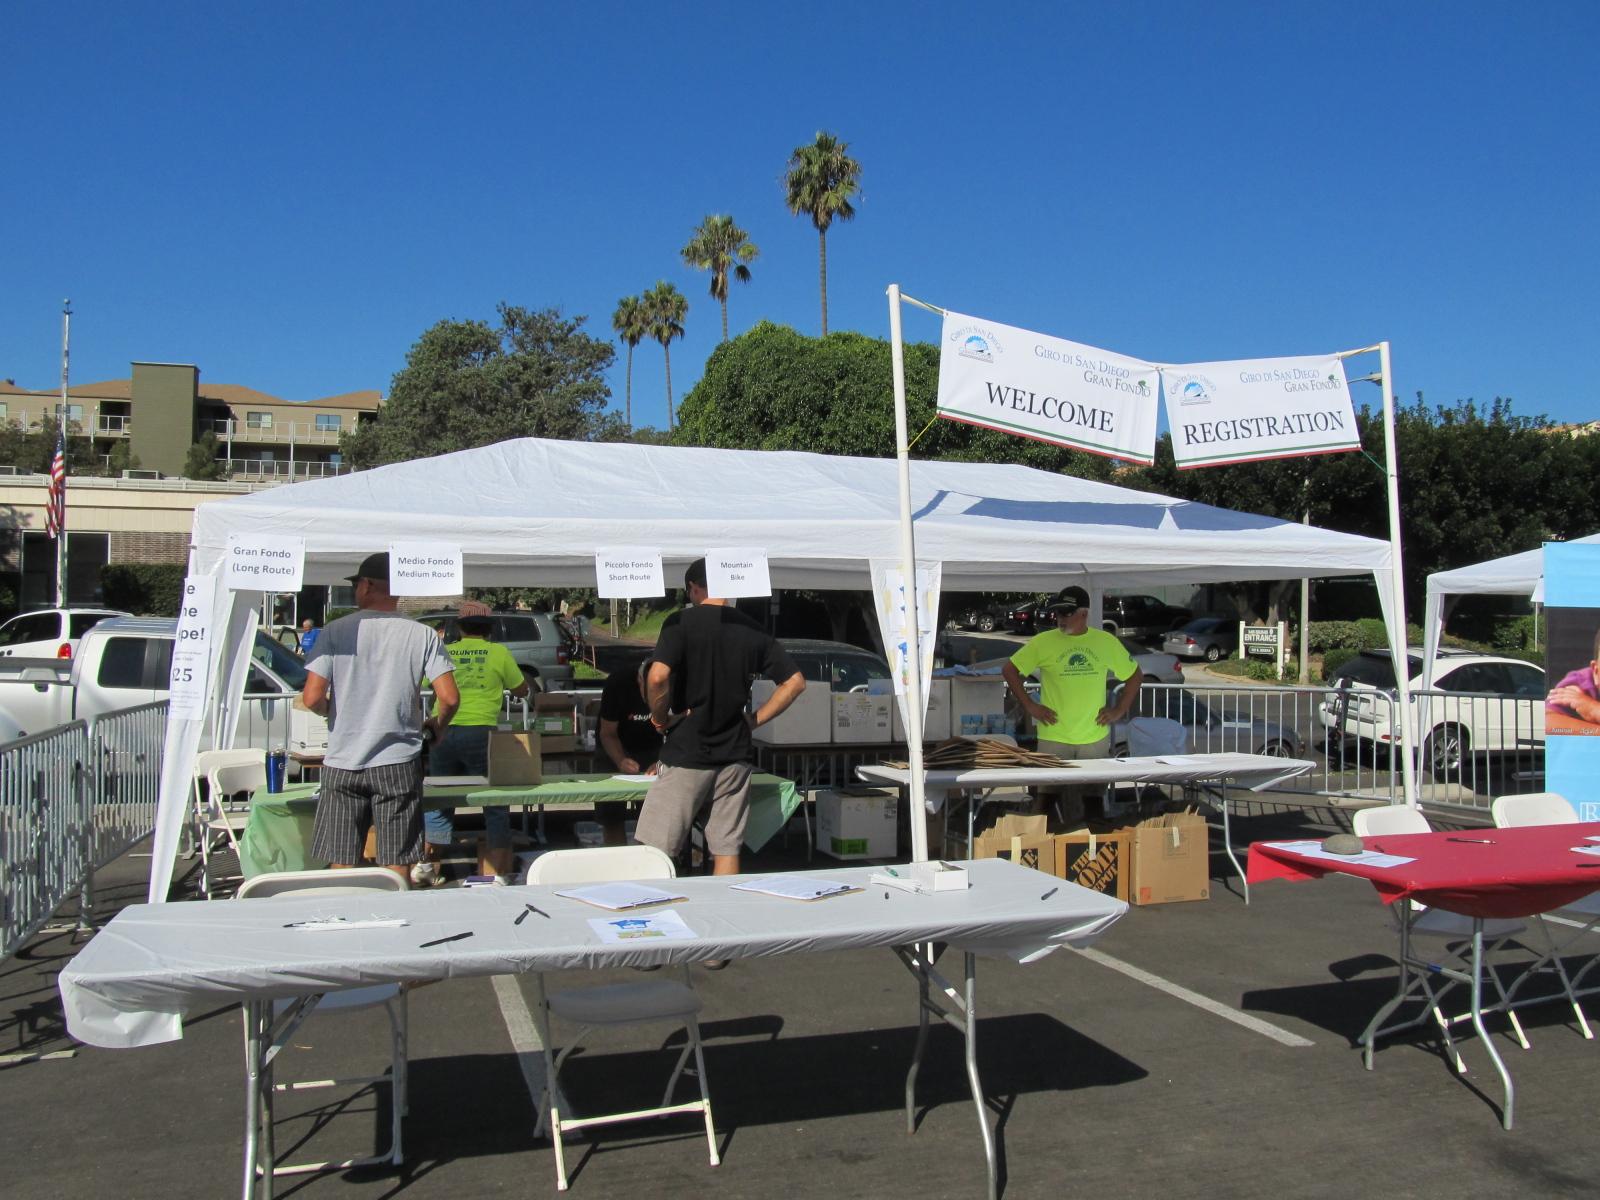 987a4f613 Giro di San Diego registration tent at Bike Expo in Solana Beach.